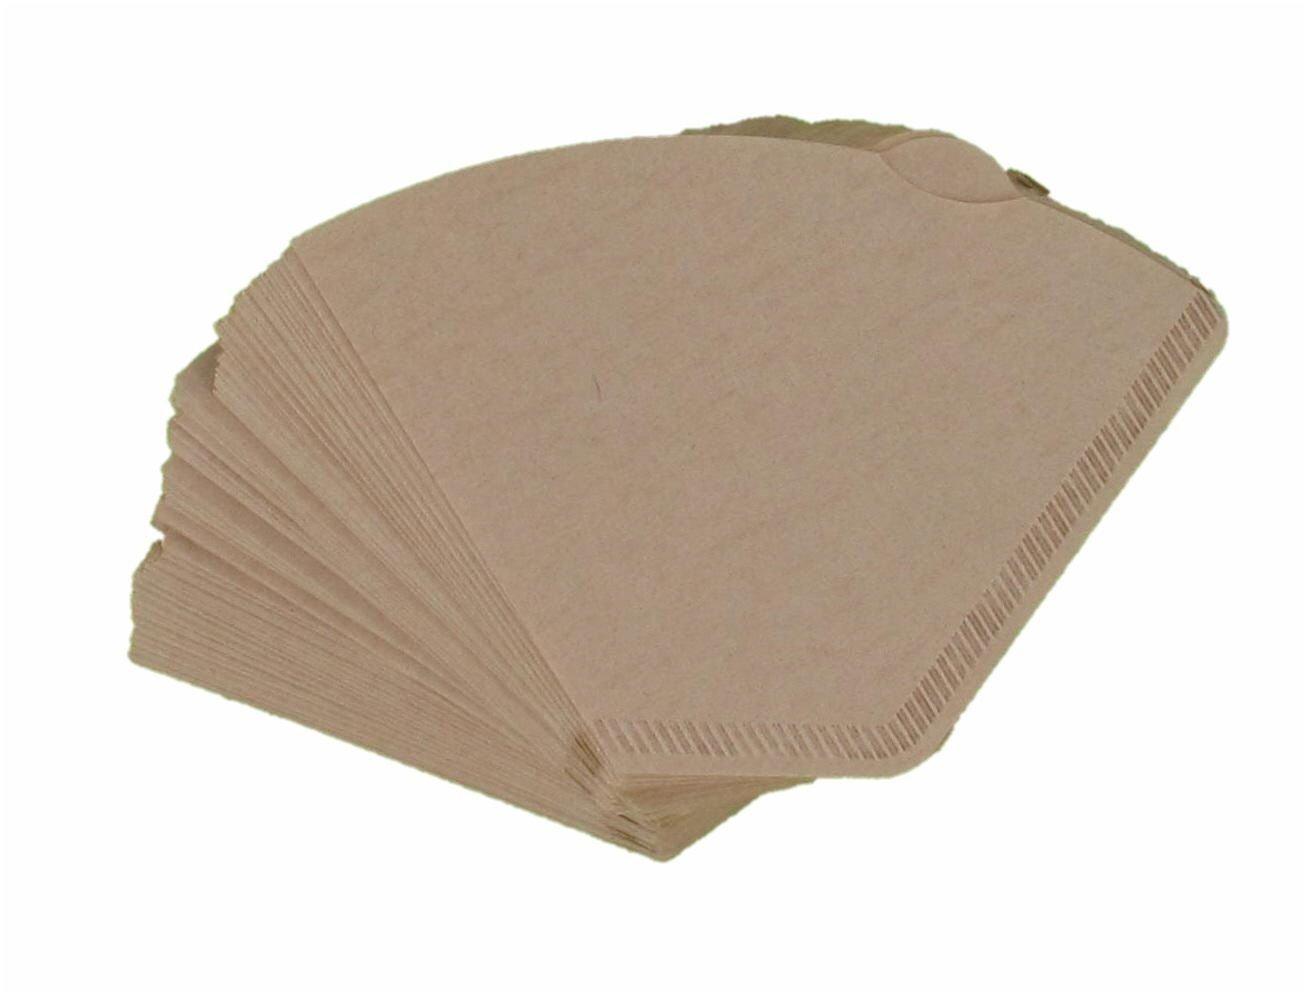 Papeles de filtro de café 200 unidades), color marrón tamaño ...